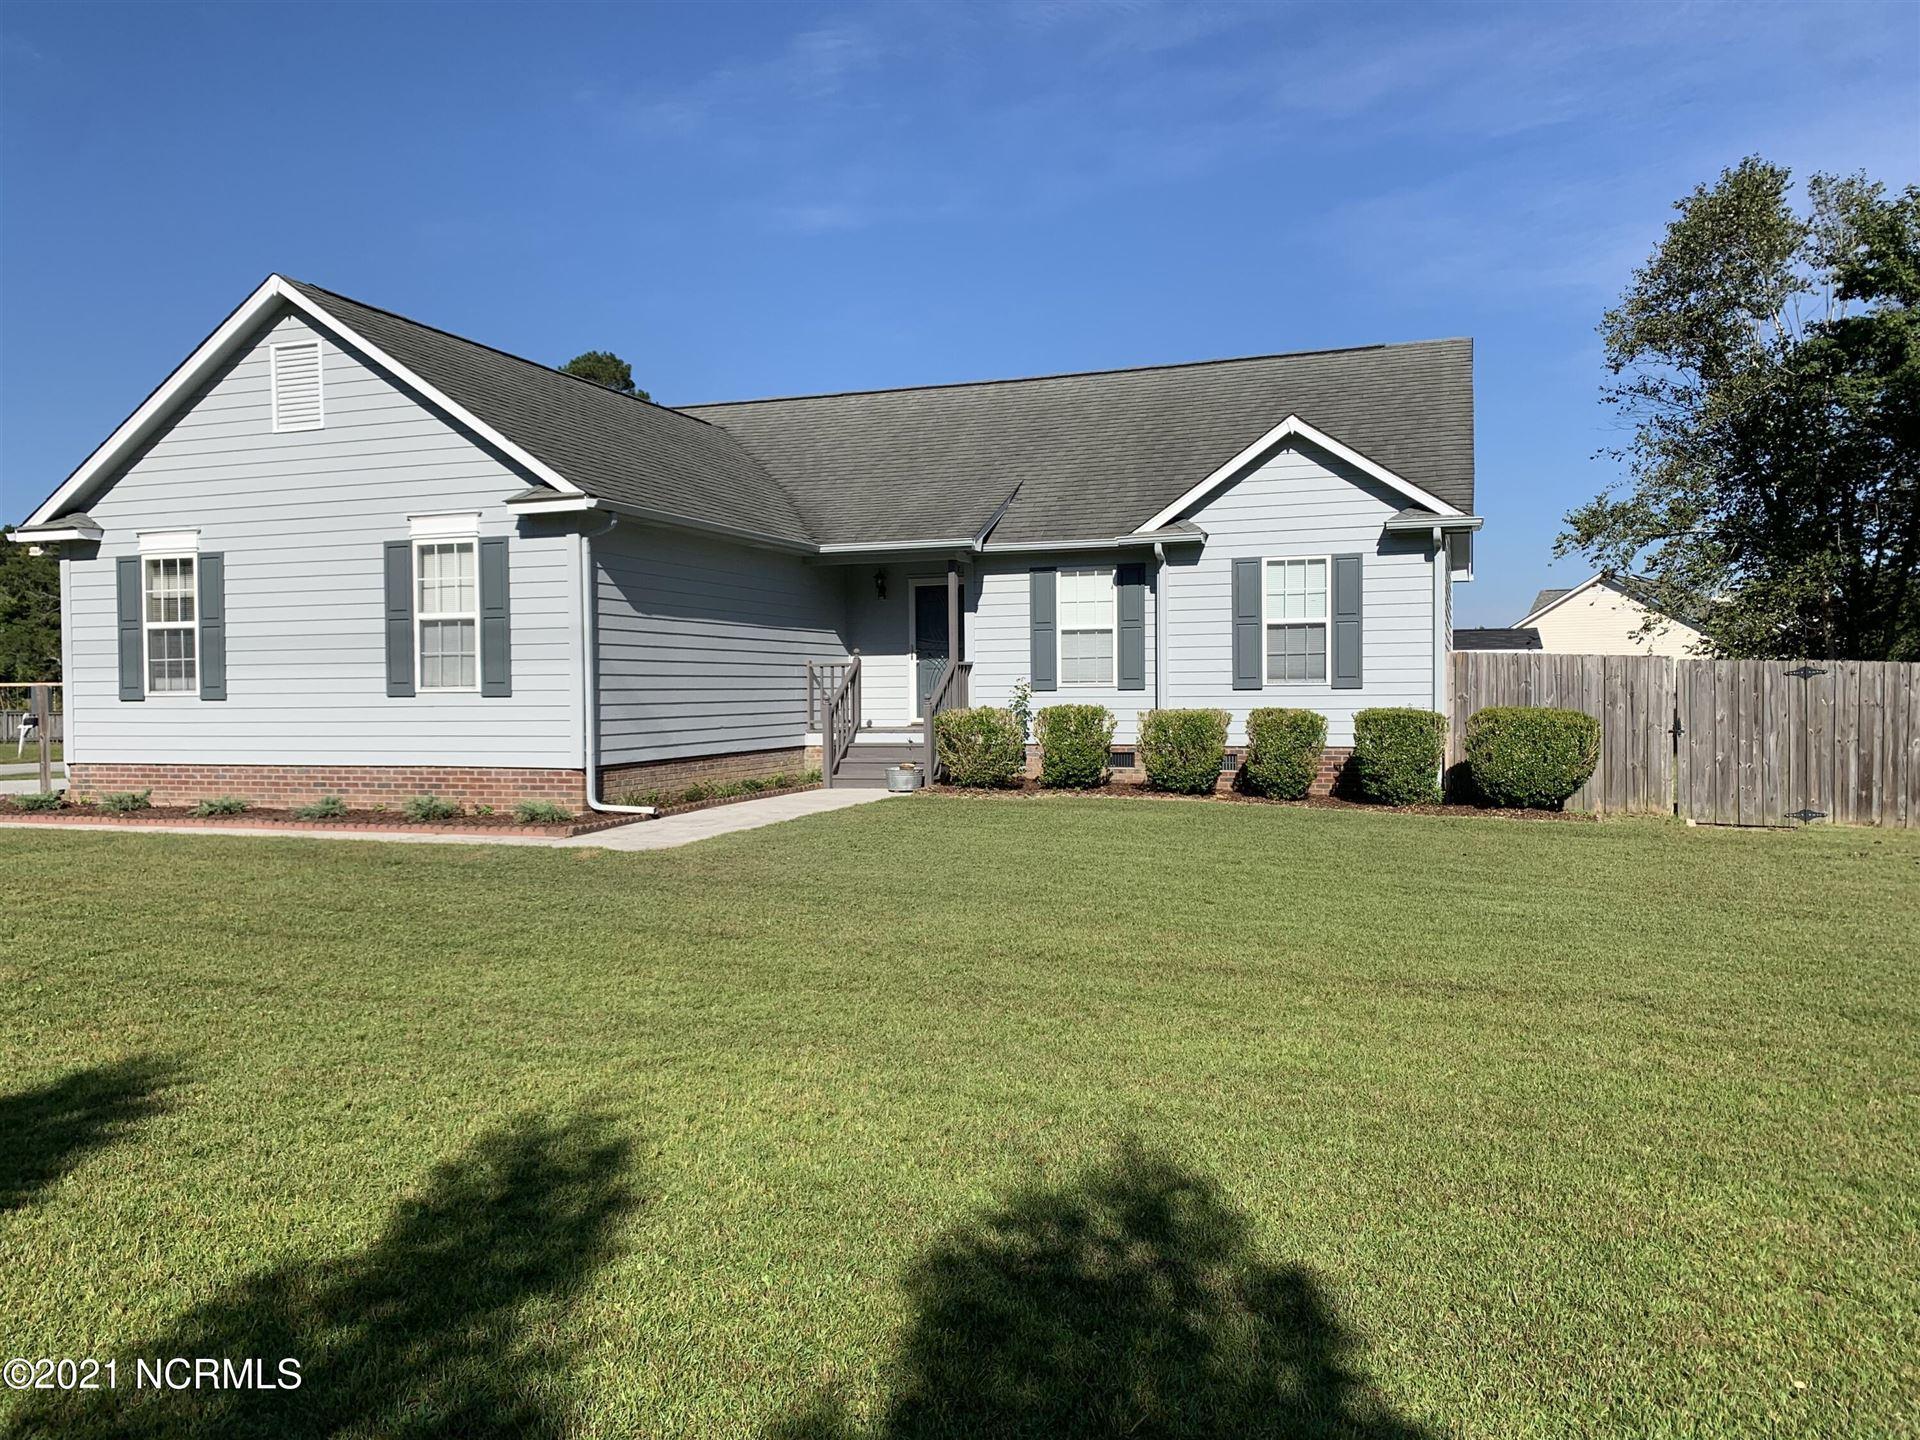 Photo of 98 Kanton Drive, Jacksonville, NC 28540 (MLS # 100295331)